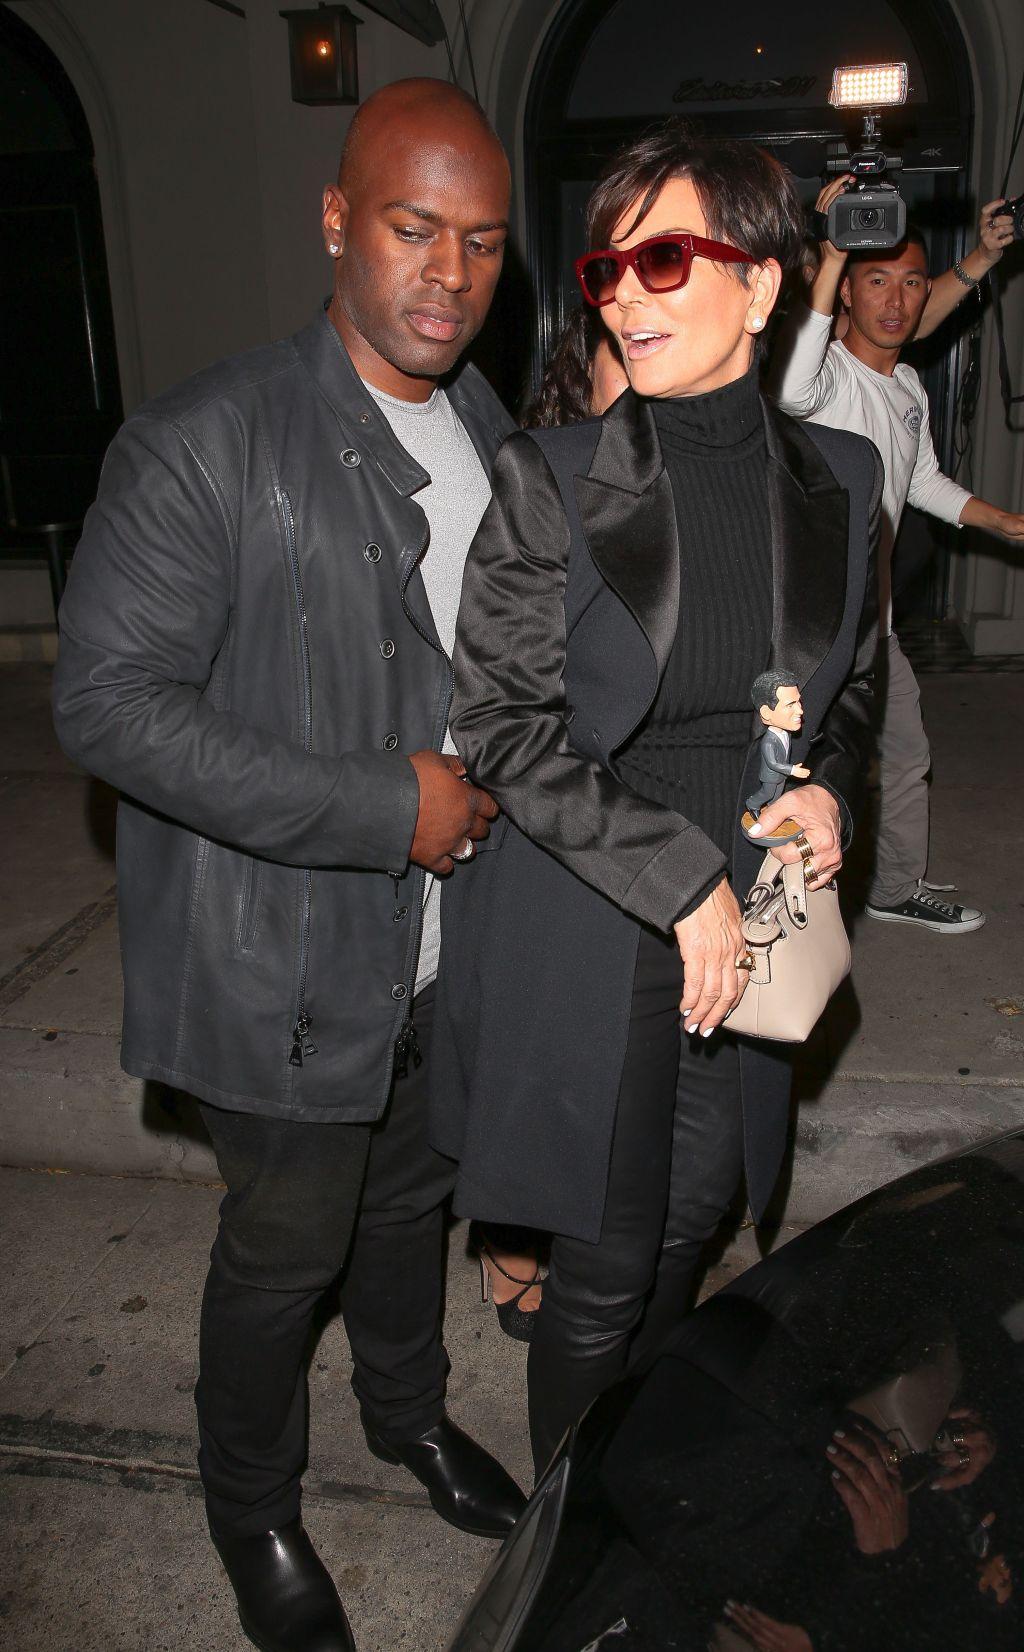 kris Jenner and boyfriend Corey Gamble go to dinner